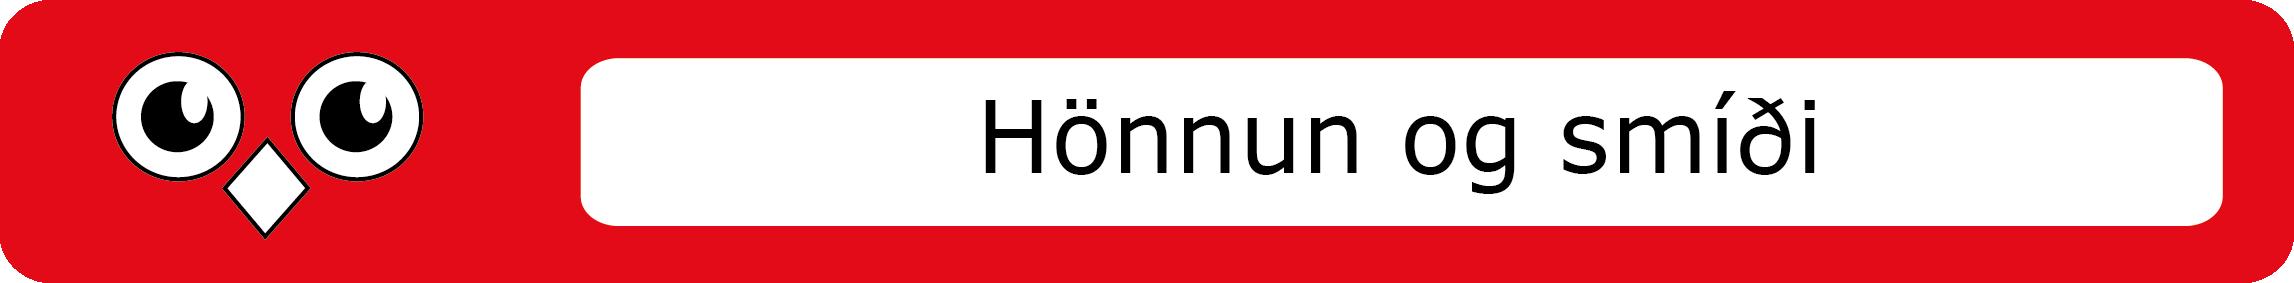 honnun_smidi